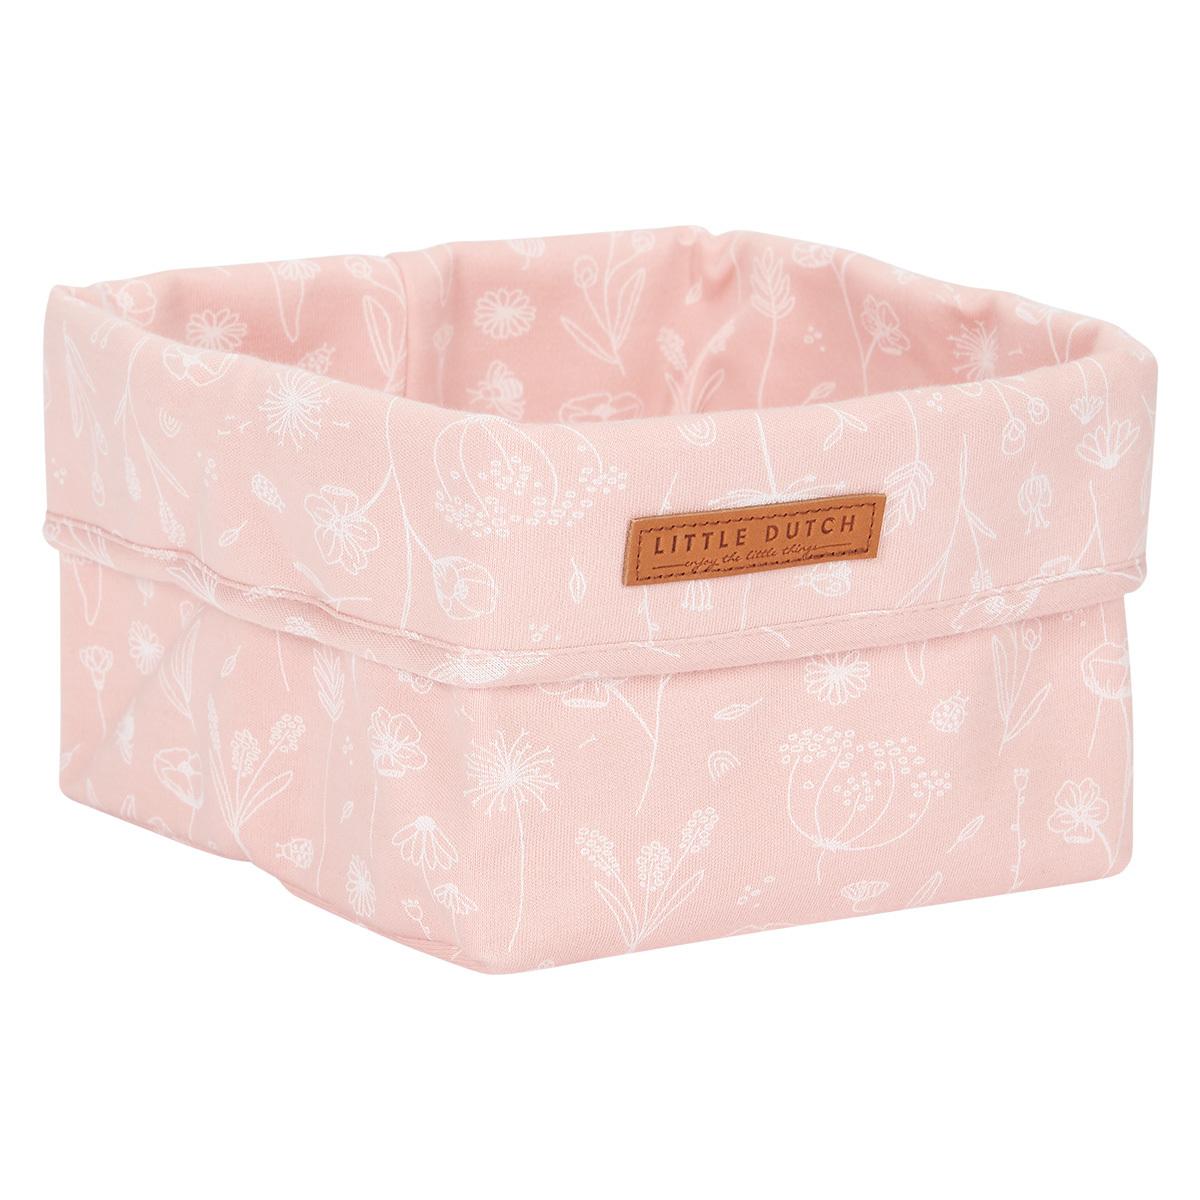 Panier & corbeille Panier de Commode Petit Wild Flowers - Pink Panier de Commode Petit Wild Flowers - Pink